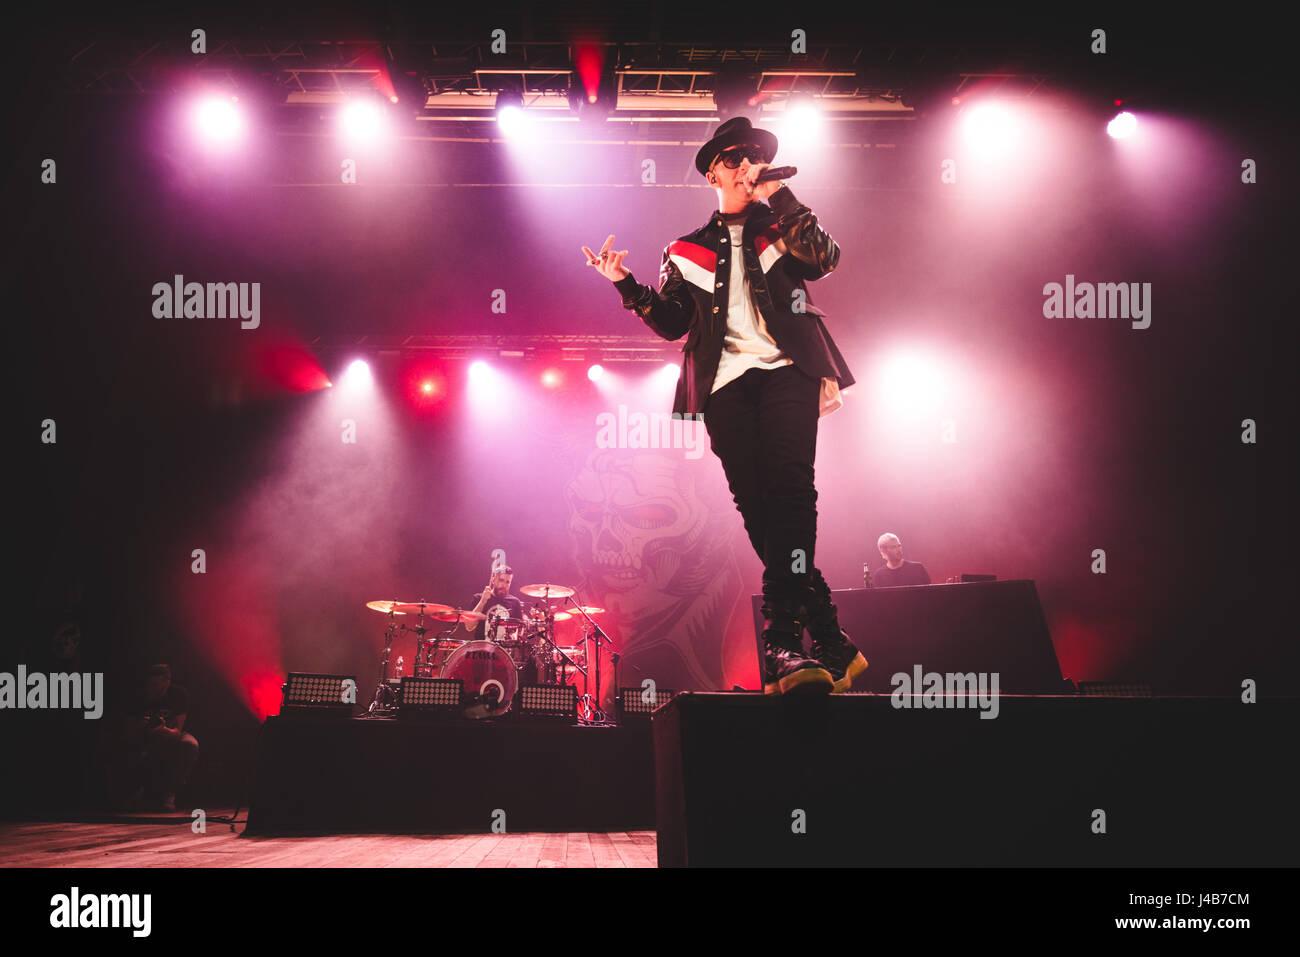 Maurizio Pisciottu popularly known as 'Salmo', is an Italian rapper from Olbia, Sardinia. His 2016 album Hellvisback Stock Photo